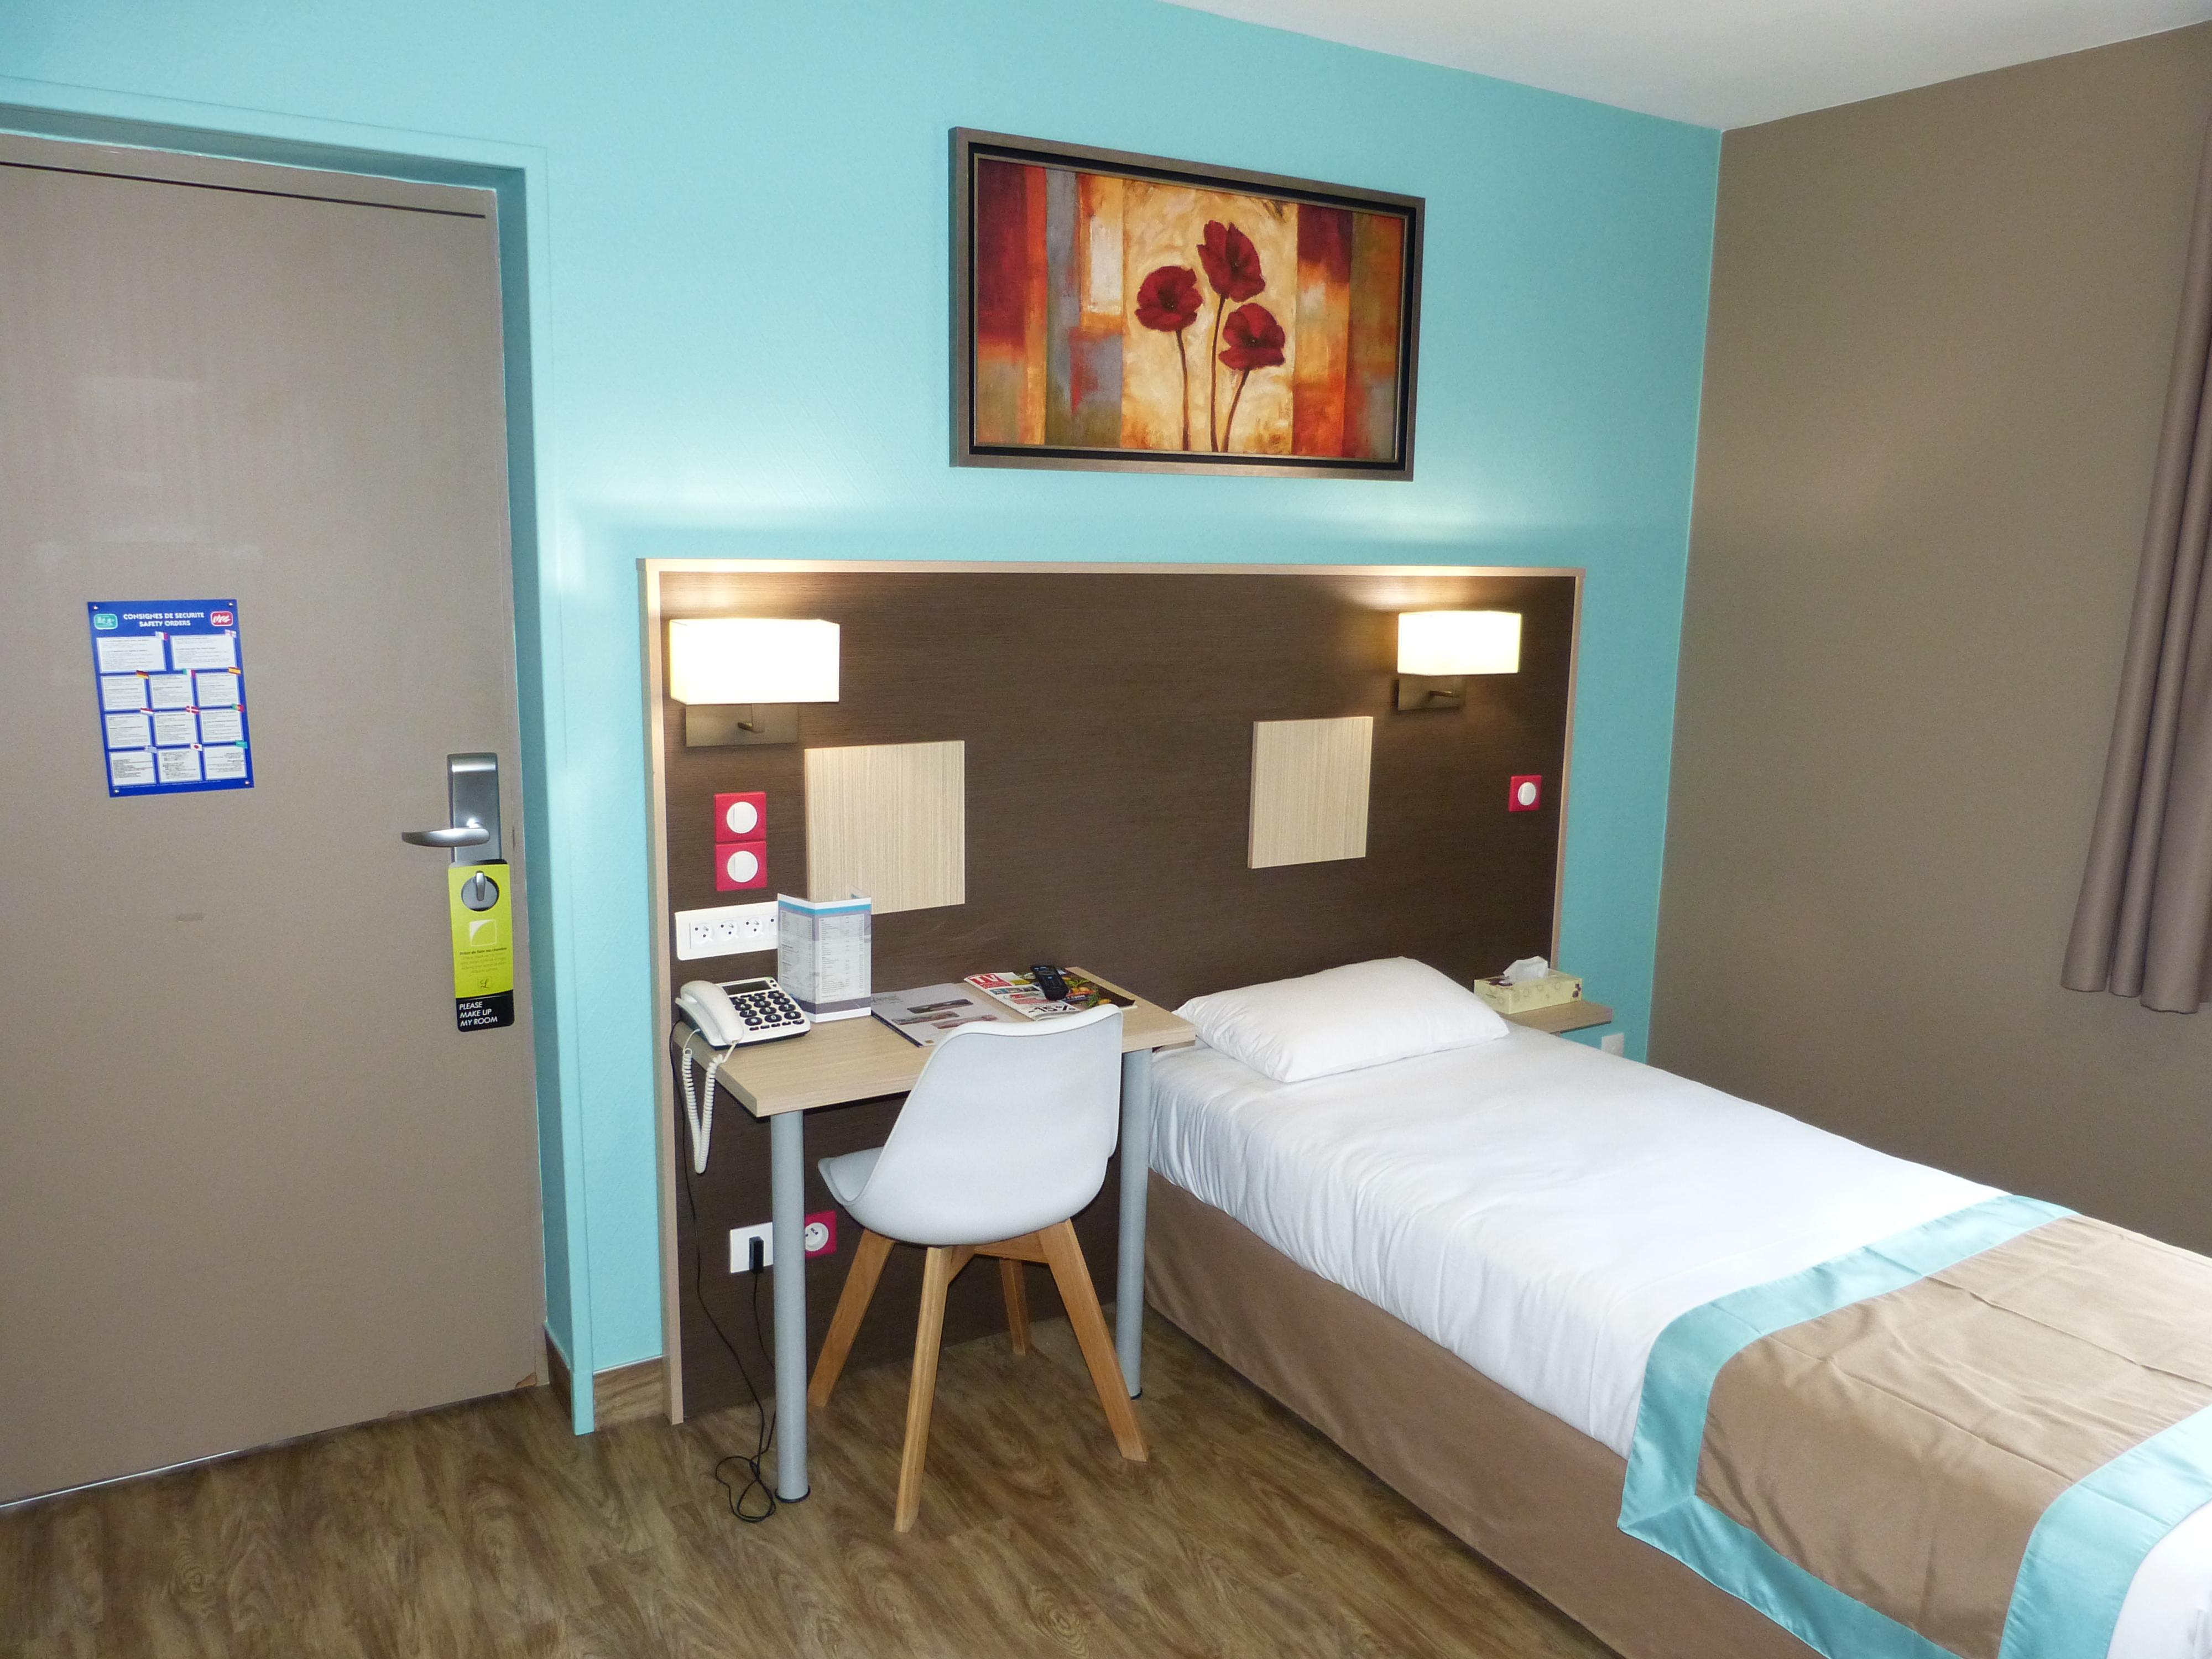 Meuble Salle De Bain Lapeyre Belle Epoque ~ Chambre Adaptee Chambres Hotel Le Mans Hotel 3 Etoiles Arbor